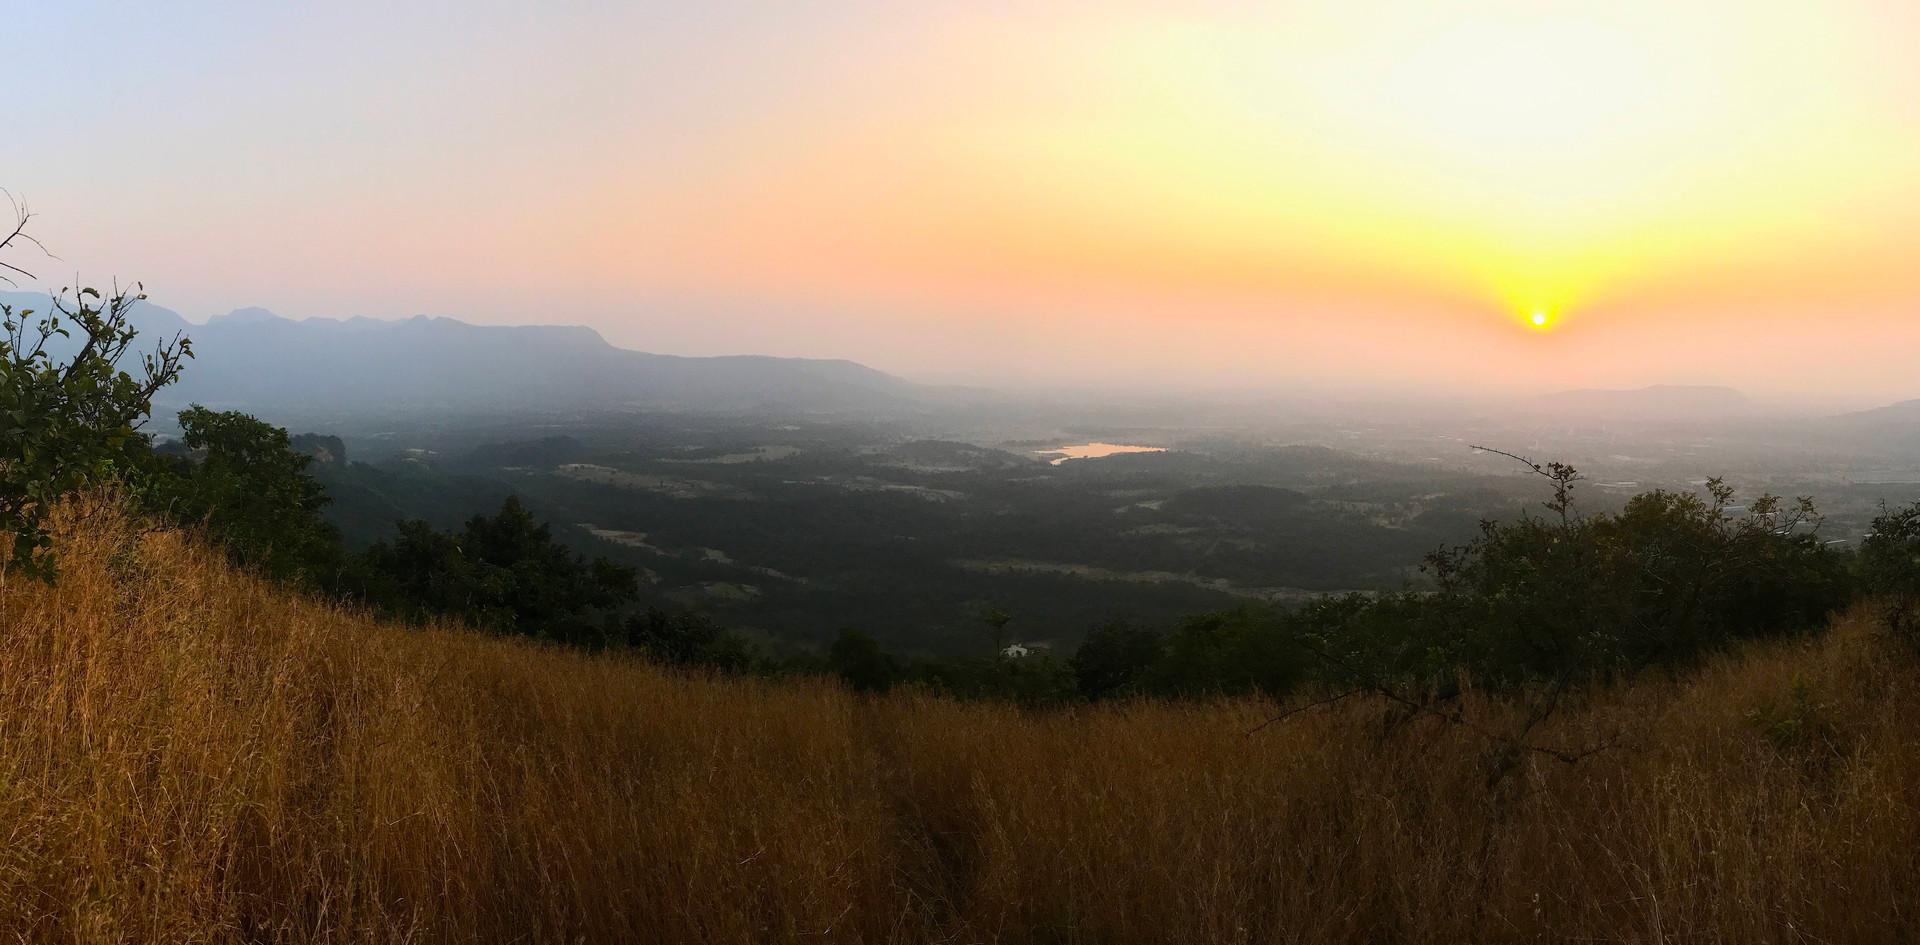 PANORAMA-SUNSET-WESTERN-GHATS-GRASSLANDS